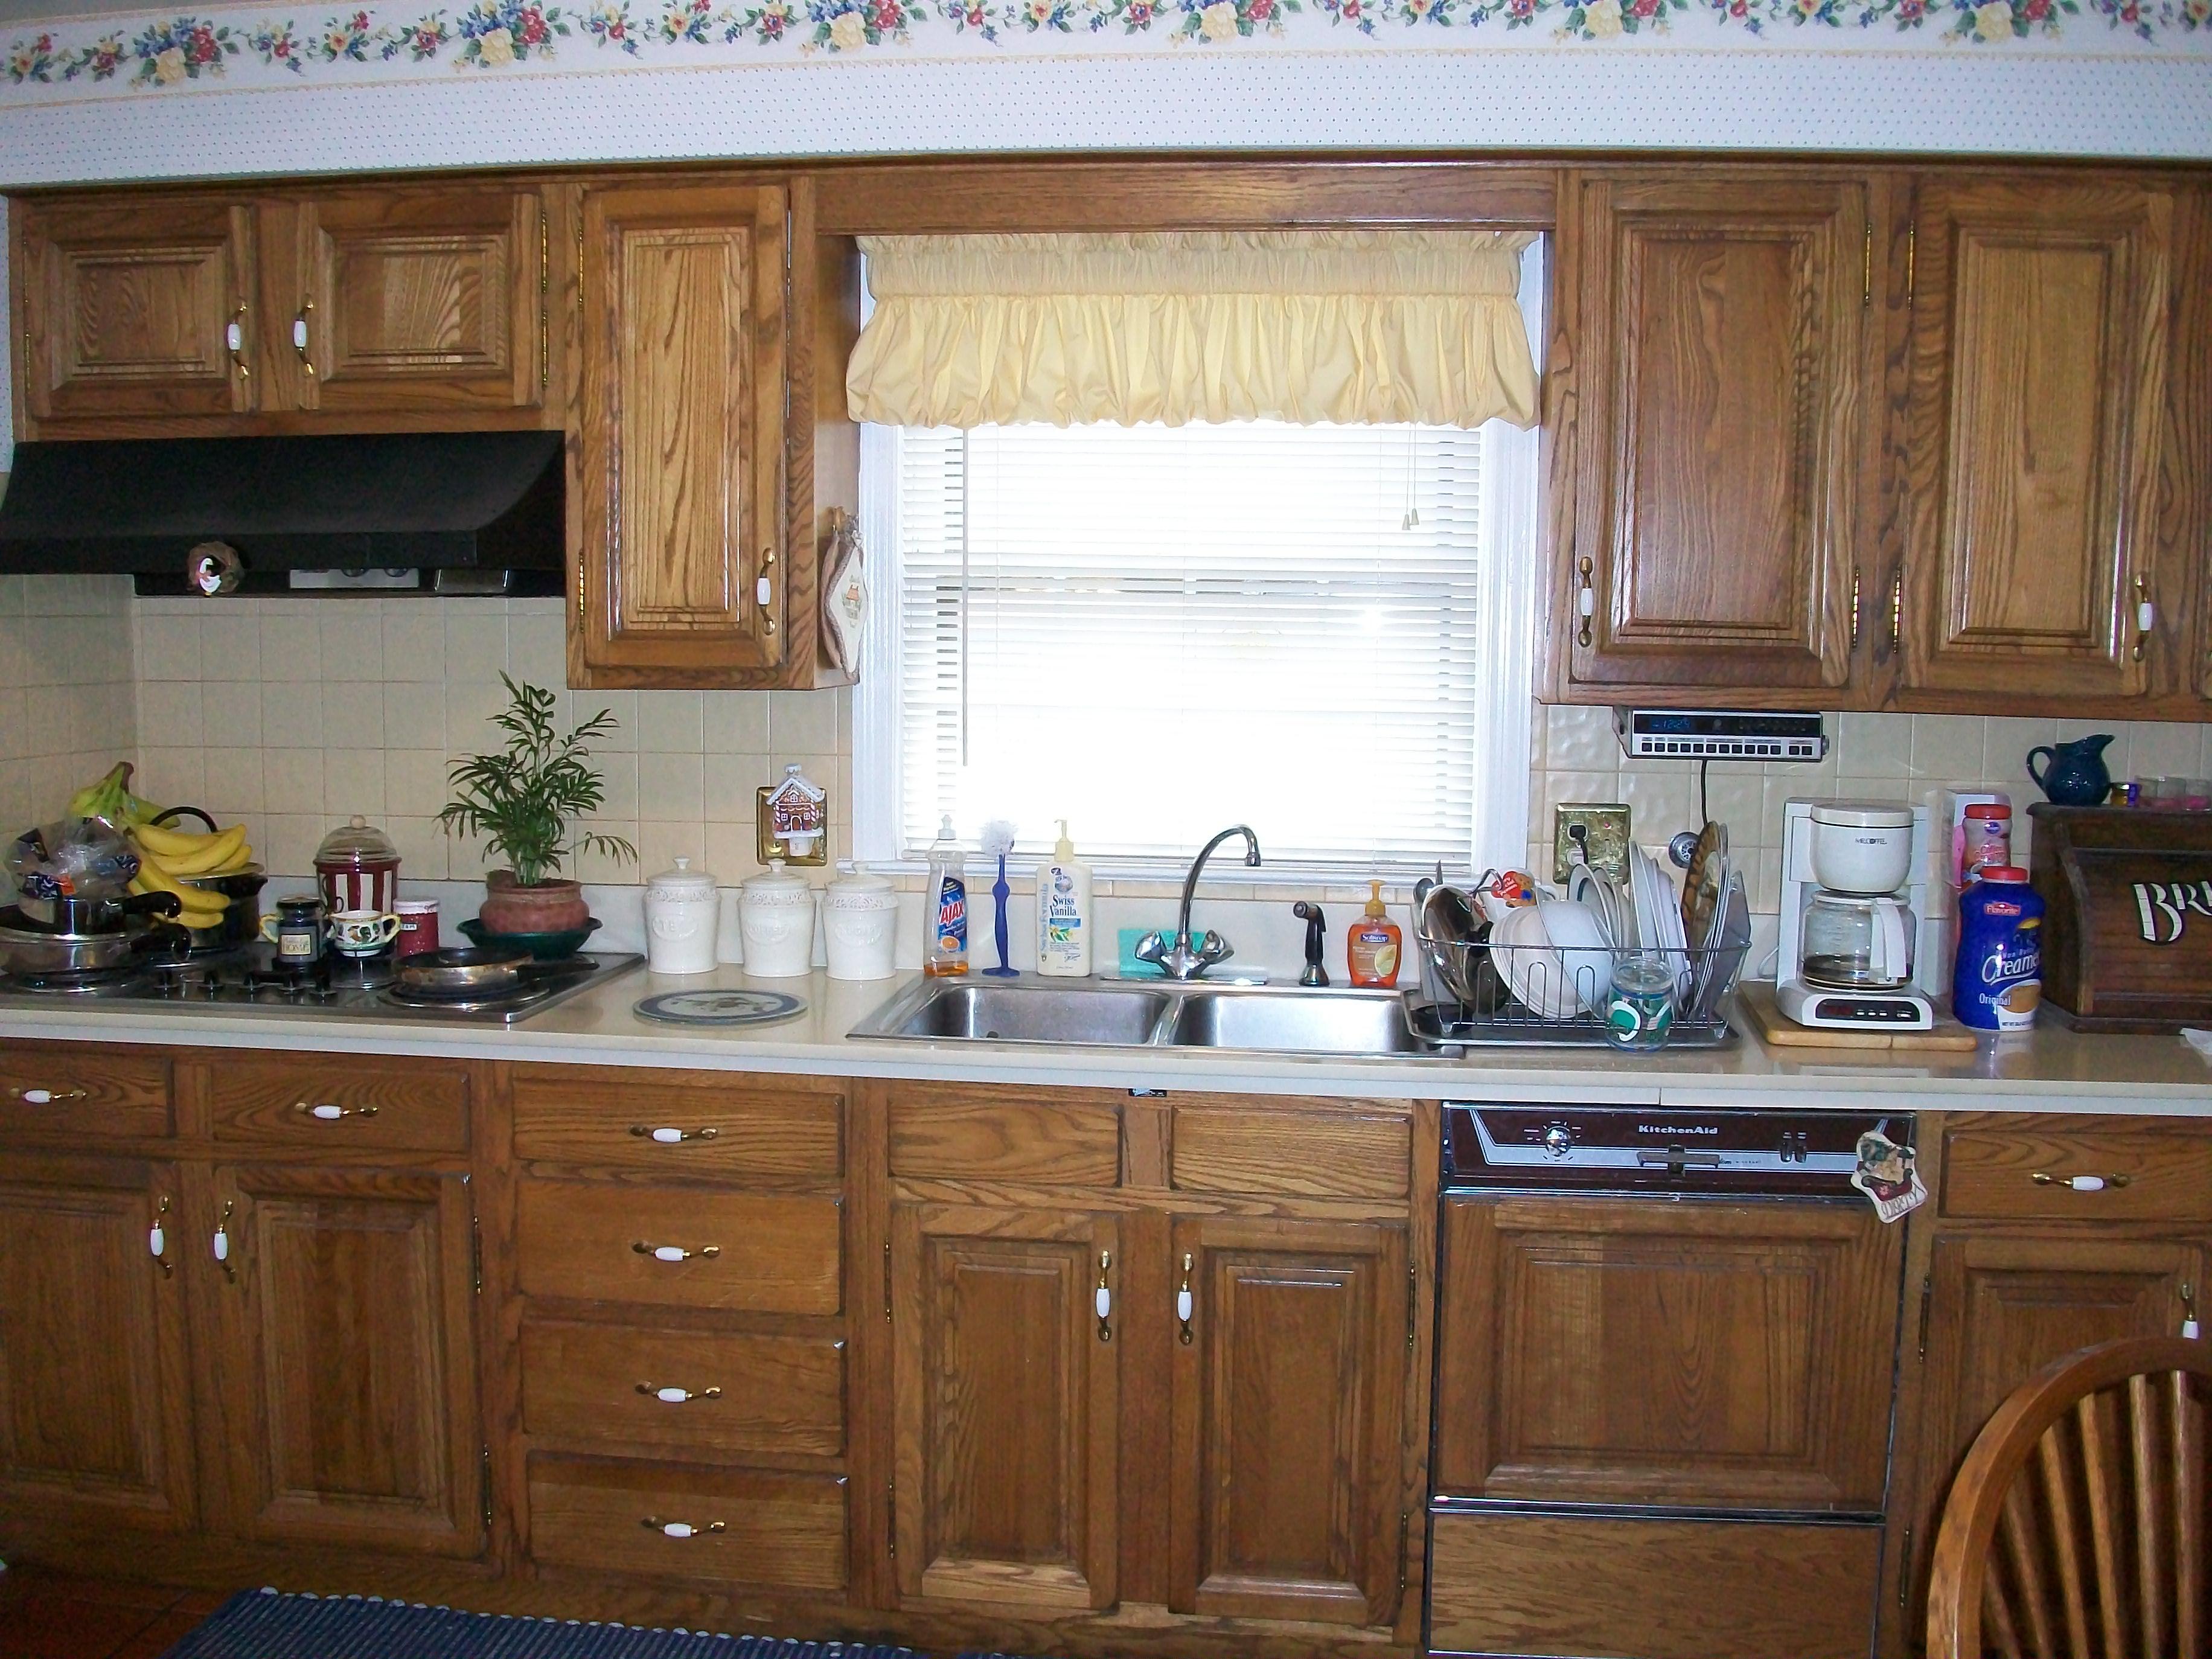 cheap kitchen door handles and knobs photo - 10